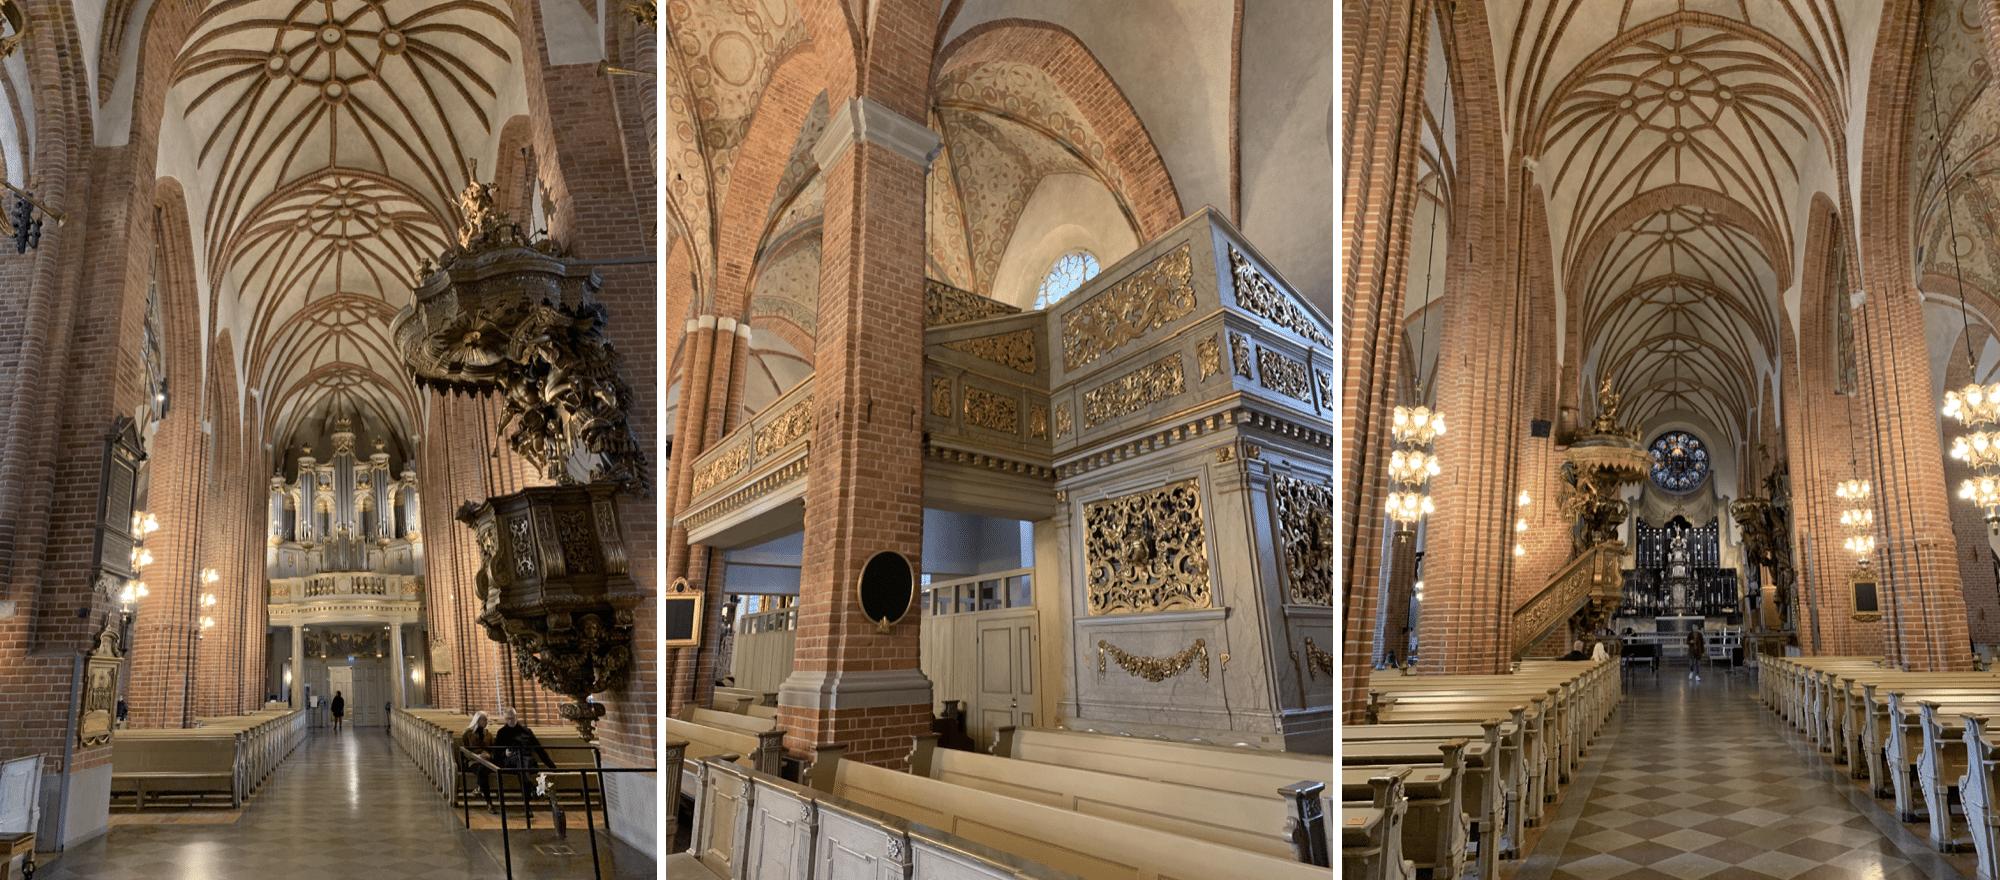 interieur de la cathedrale storkyrkan a stockholm